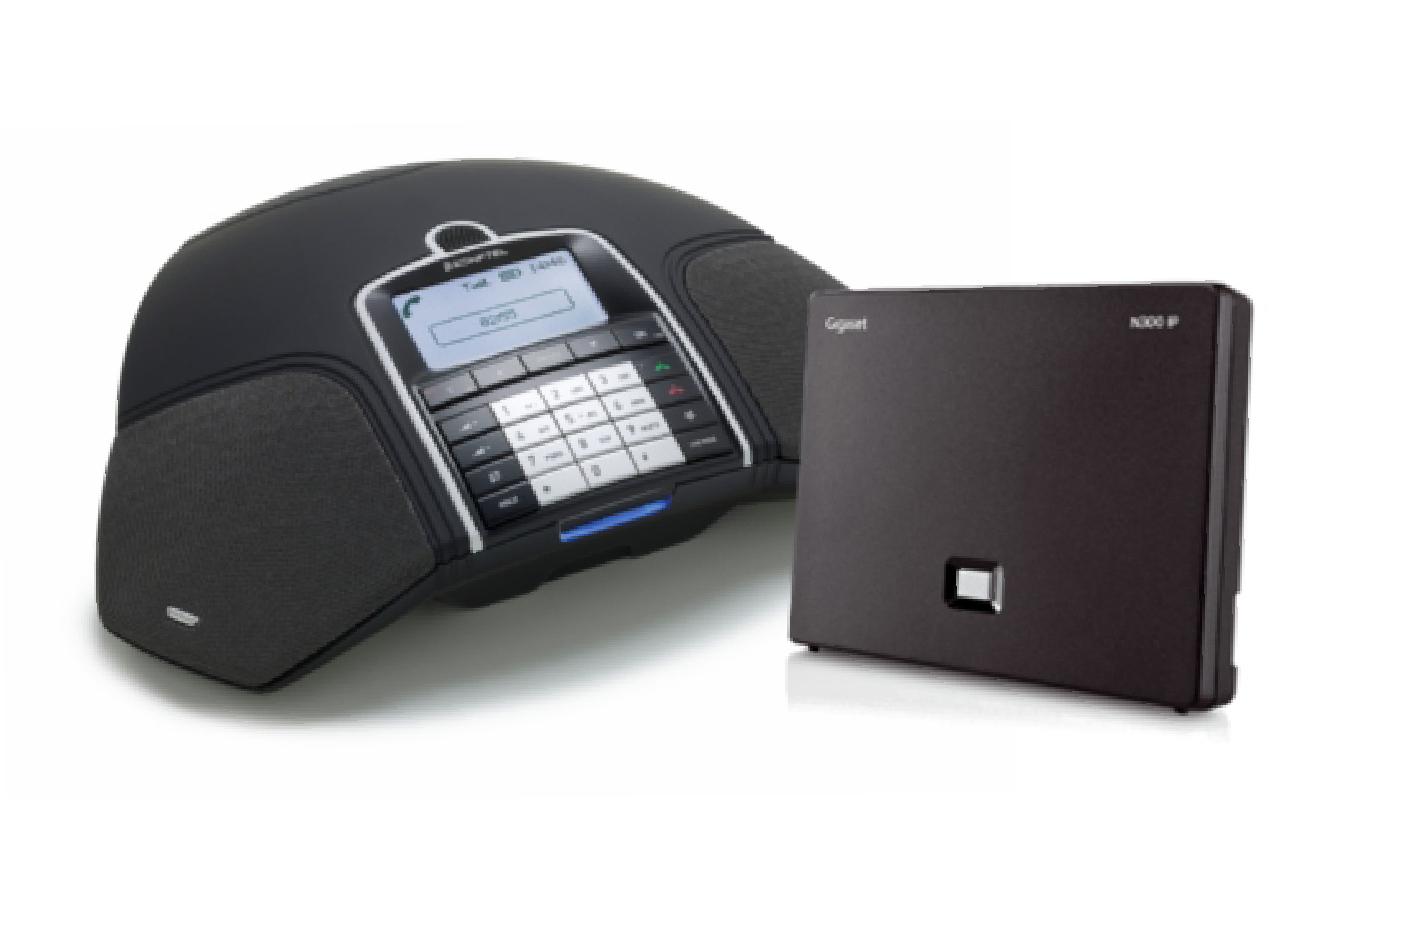 Konftel 300Wx with a Gigaset N300IP DECT Base Station